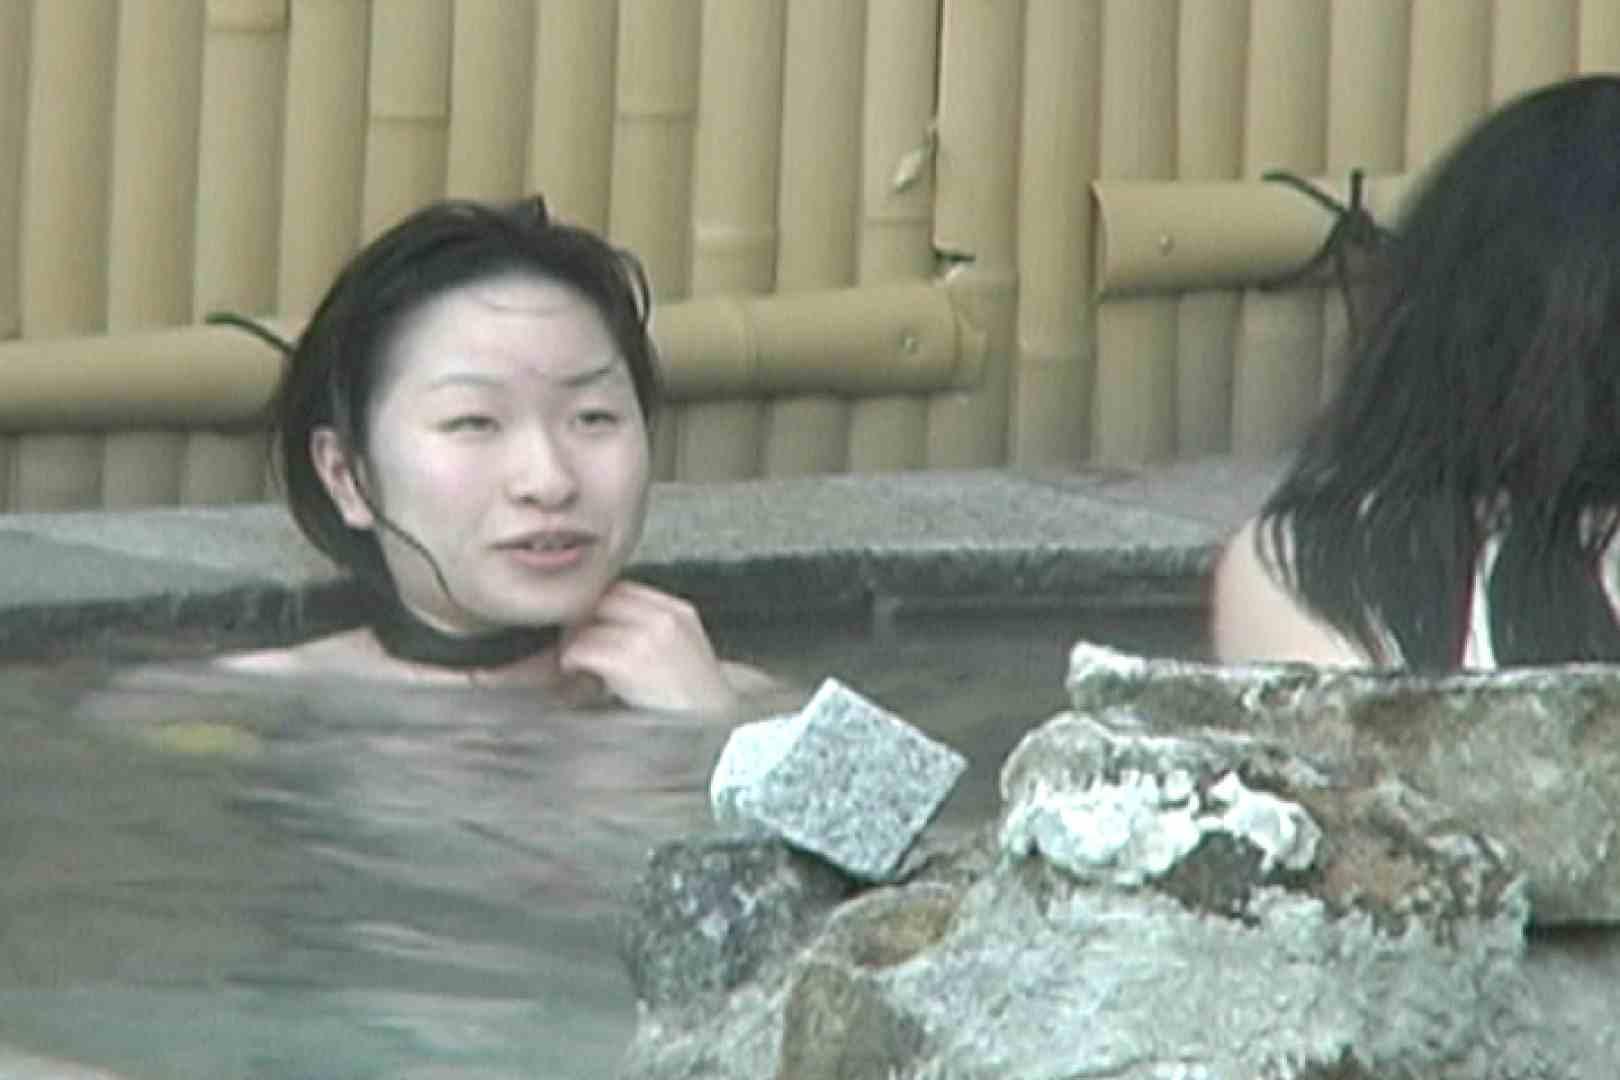 Aquaな露天風呂Vol.595 OLセックス 覗きぱこり動画紹介 89画像 77